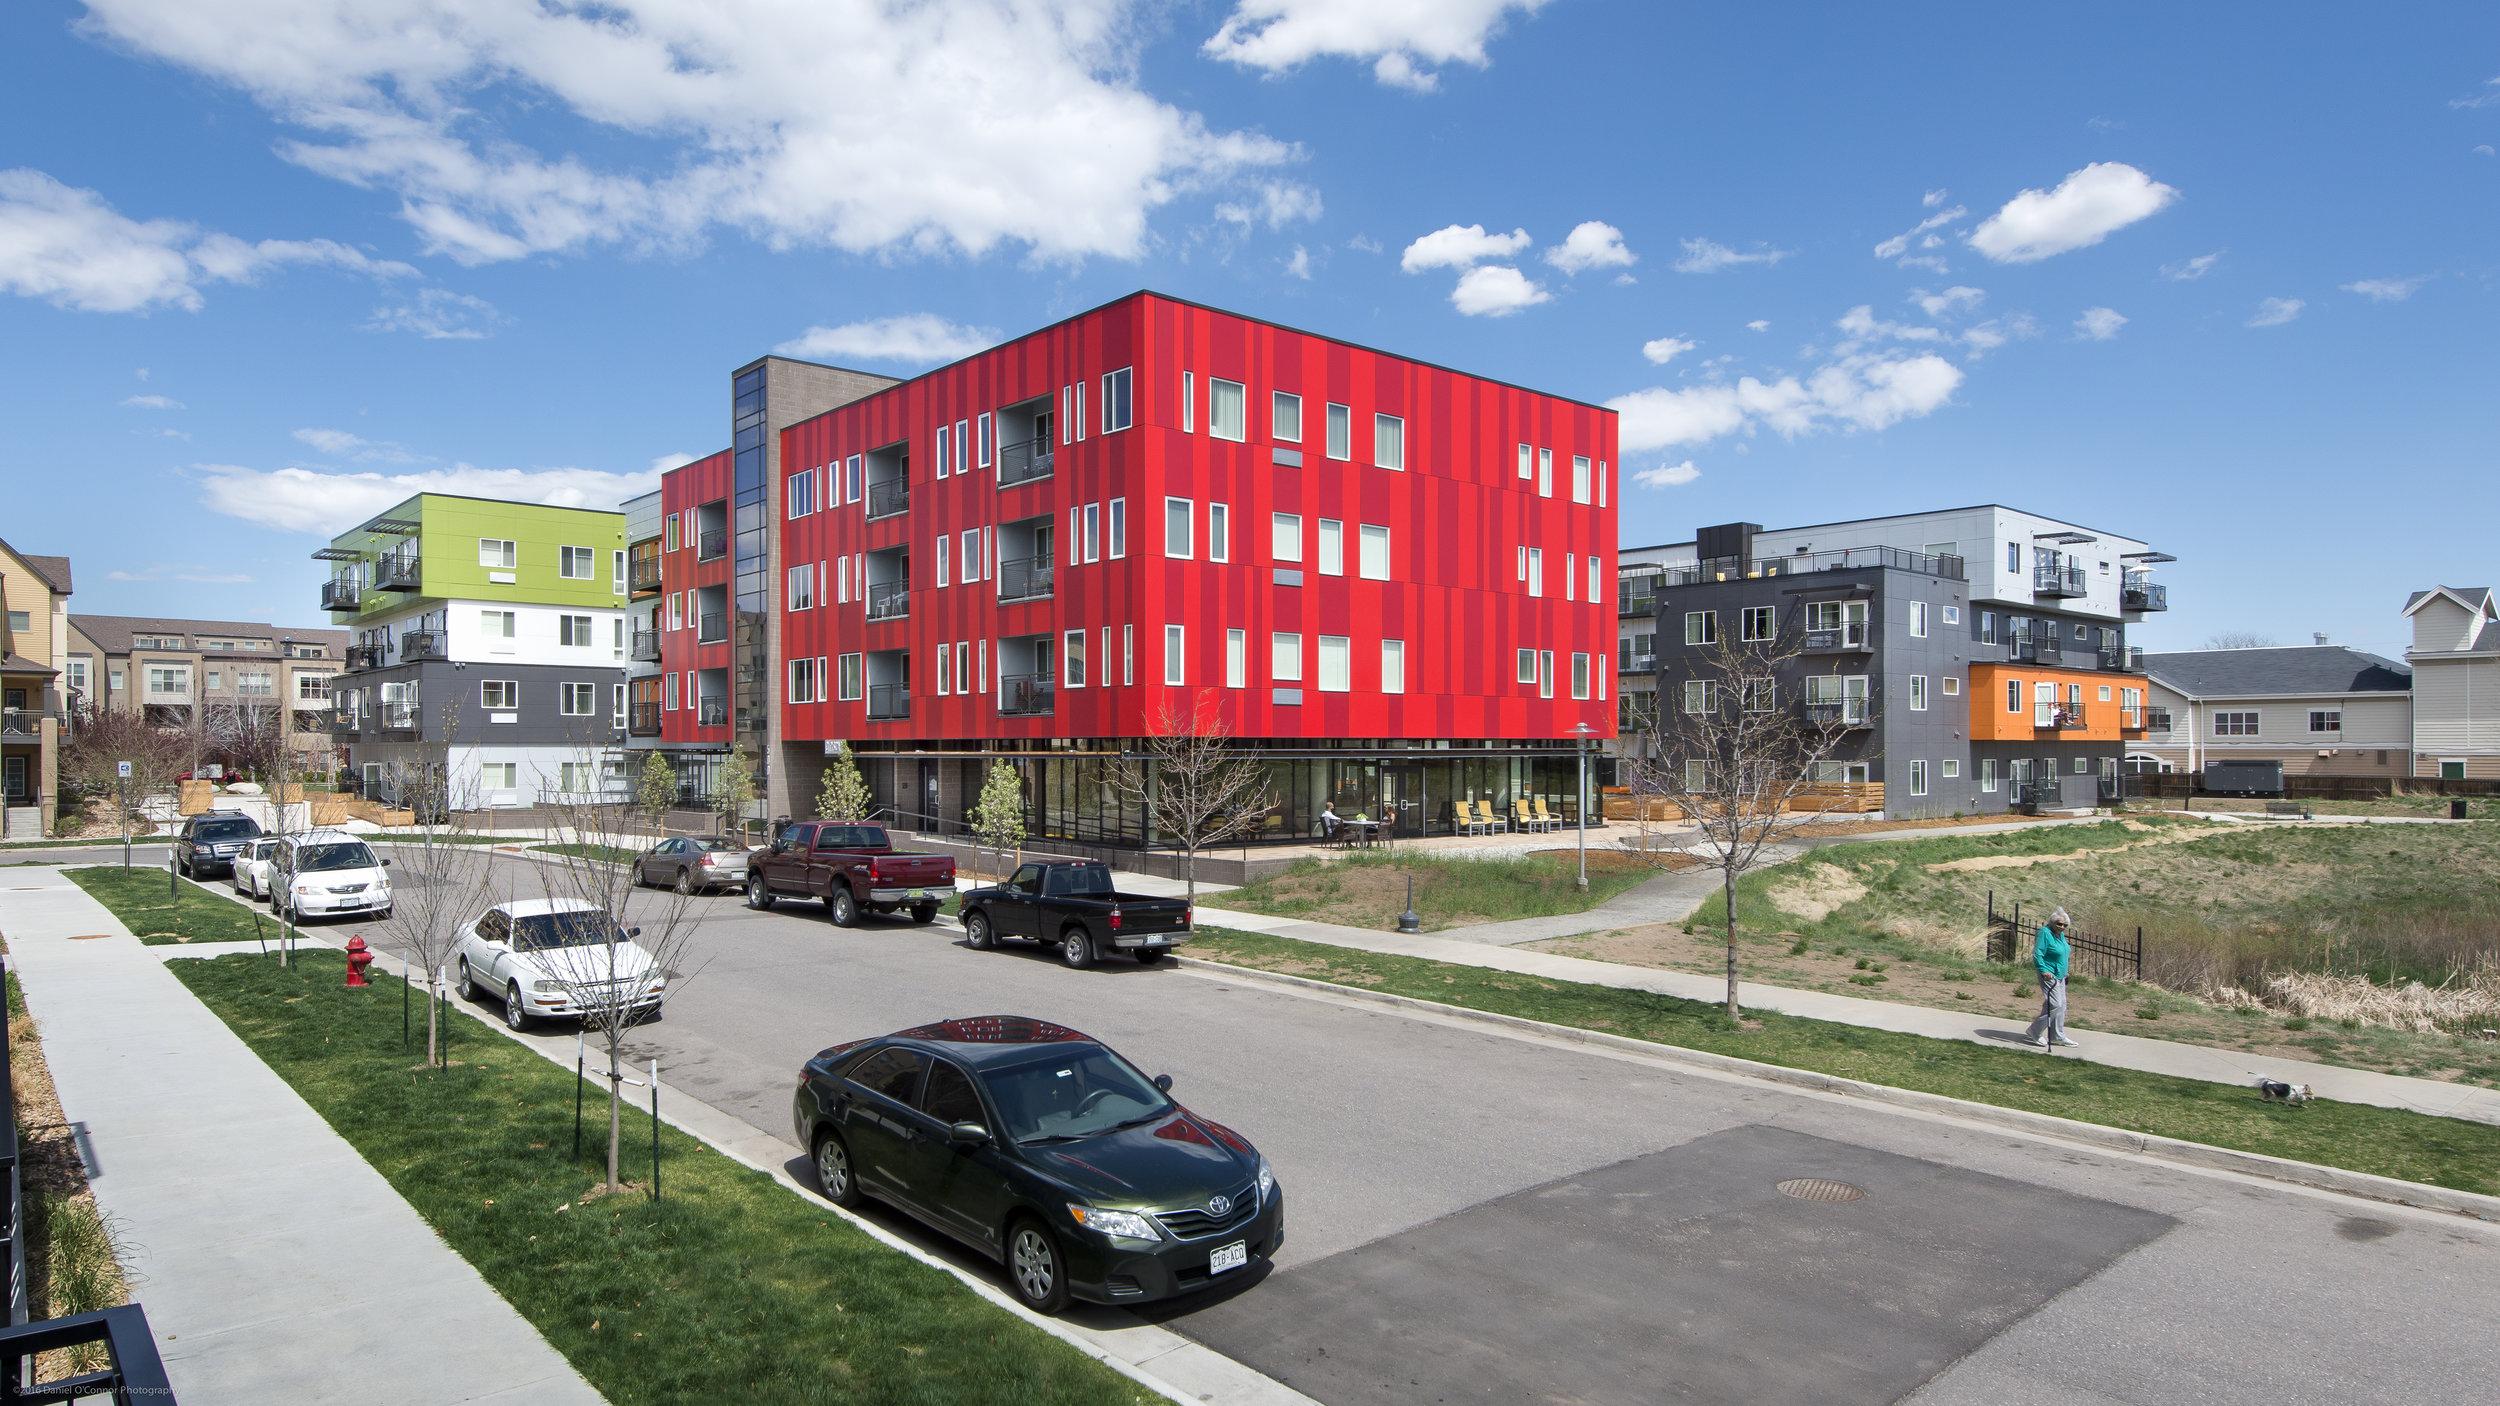 Cityscape at Belmar - 2017 Community Sustainability Award2017 Multifamily Executive Award2017 NAHRO Agency Awards of Excellence2016 Housing Colorado People's Choice Award2016 Colorado NAHRO Affordable Housing Design Award2016 Senior Housing News Architecture & Design Award